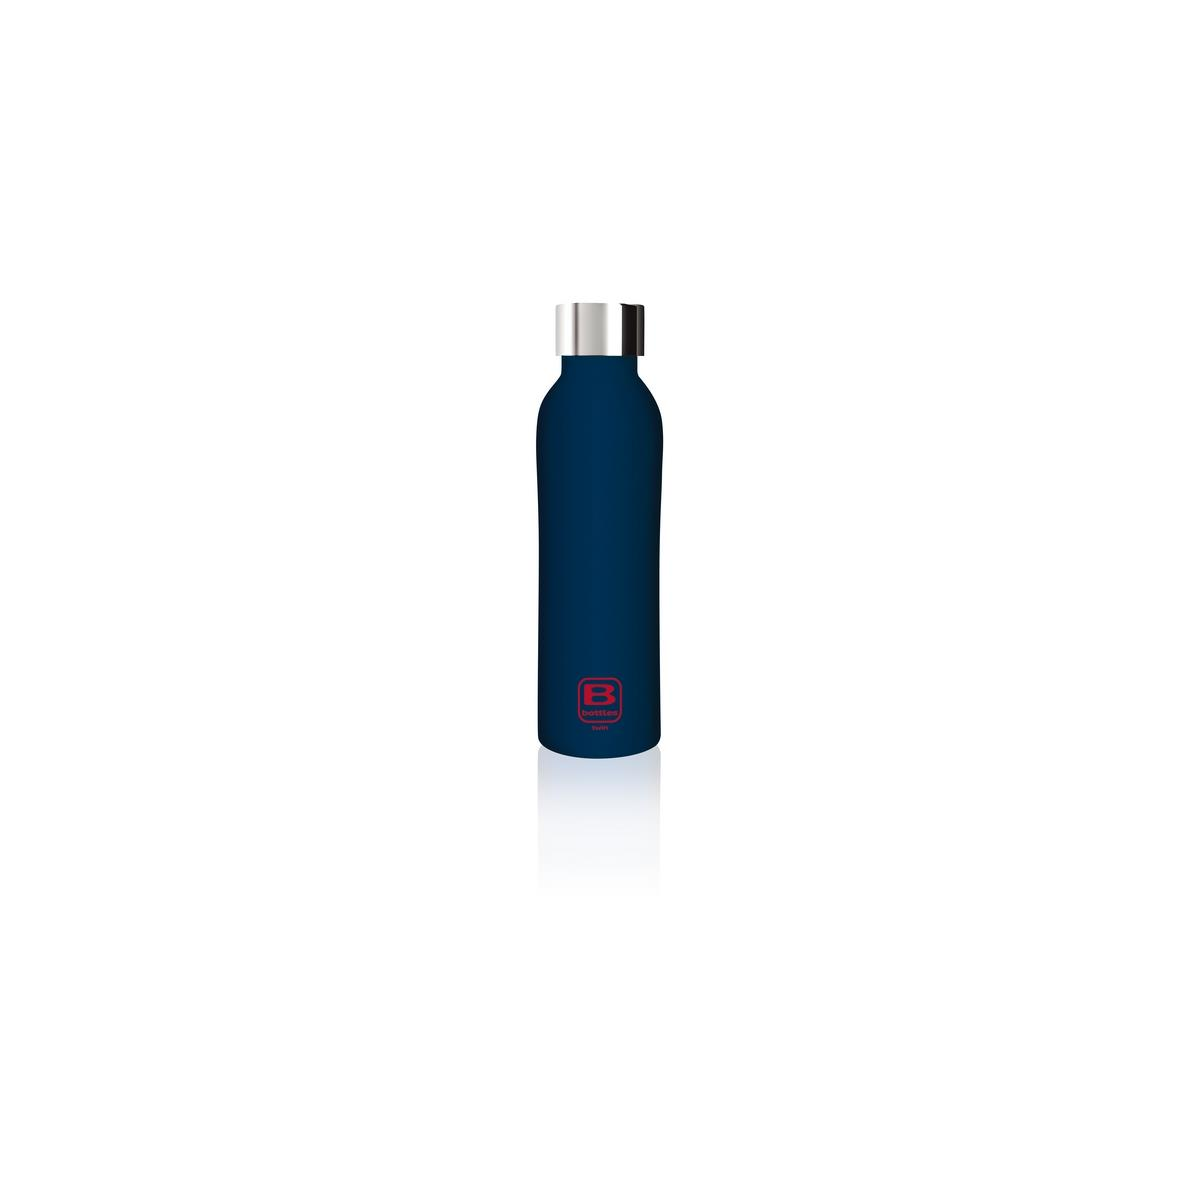 B Bottles Twin - Blue Marine - 500 ml - Bottiglia Termica a doppia parete in acciaio inox 18/10